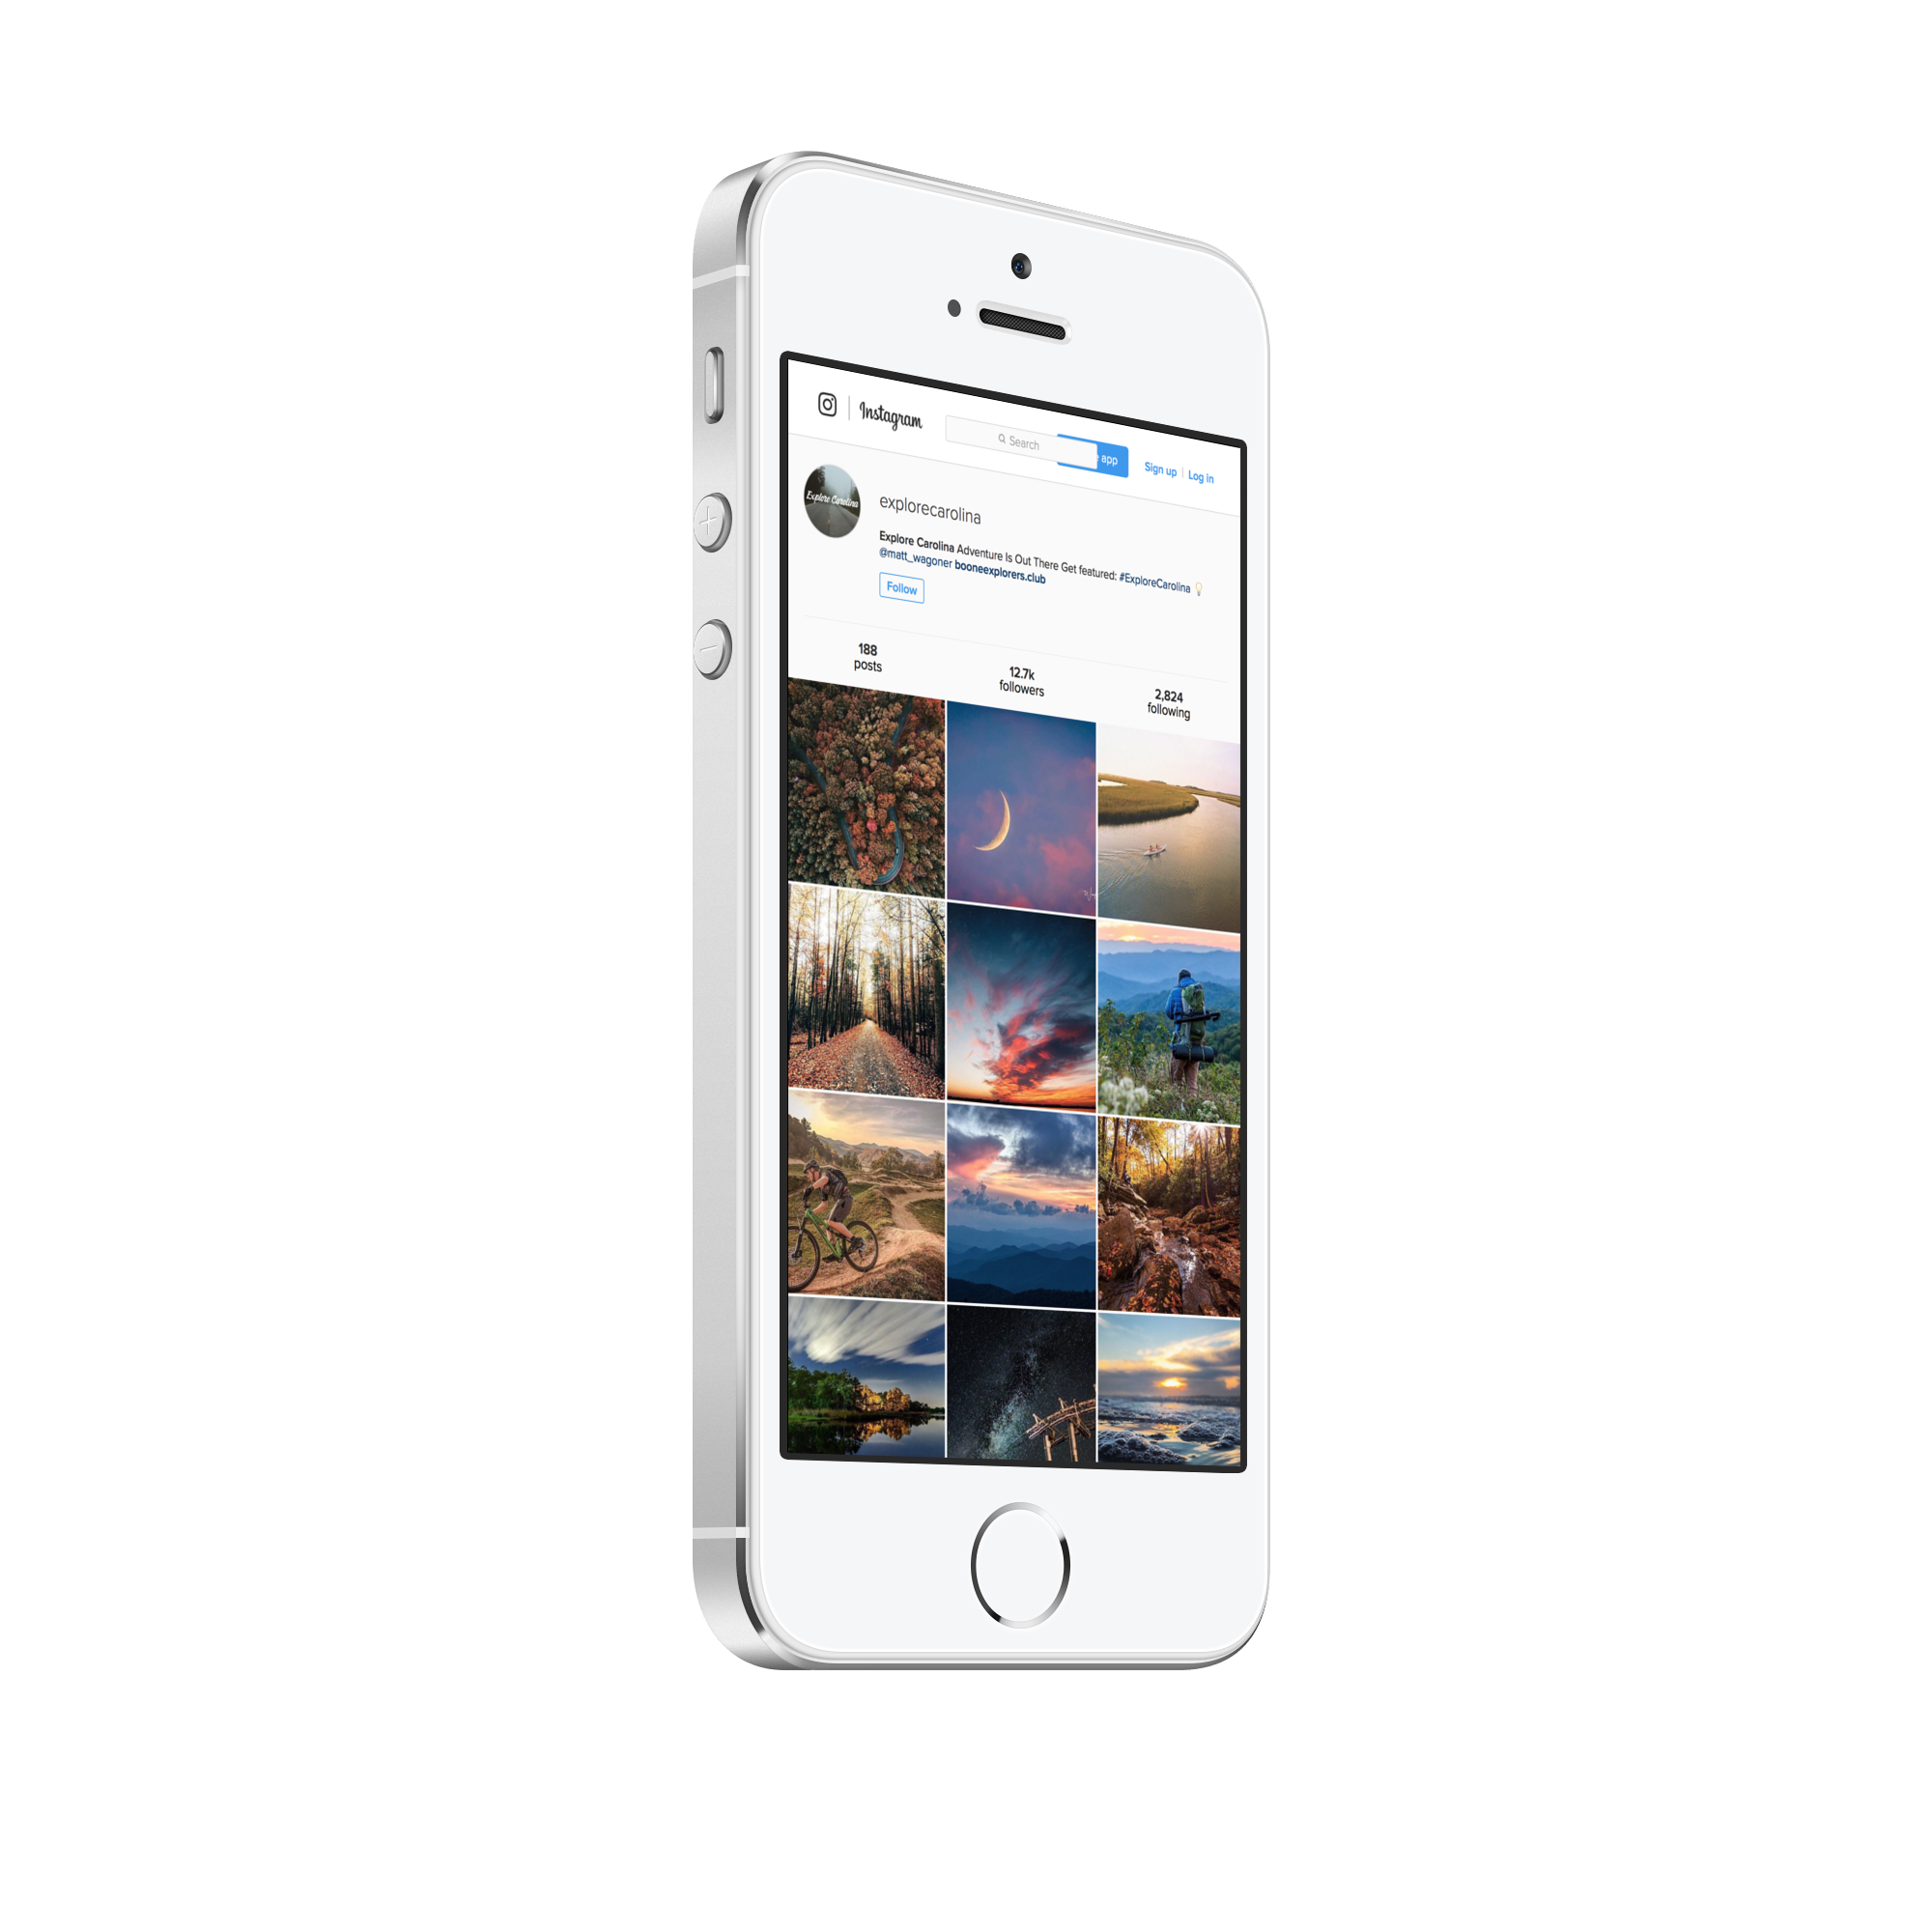 https---www.instagram.com-explorecarolina-(20161106)_iphone5s_silver_side1.png